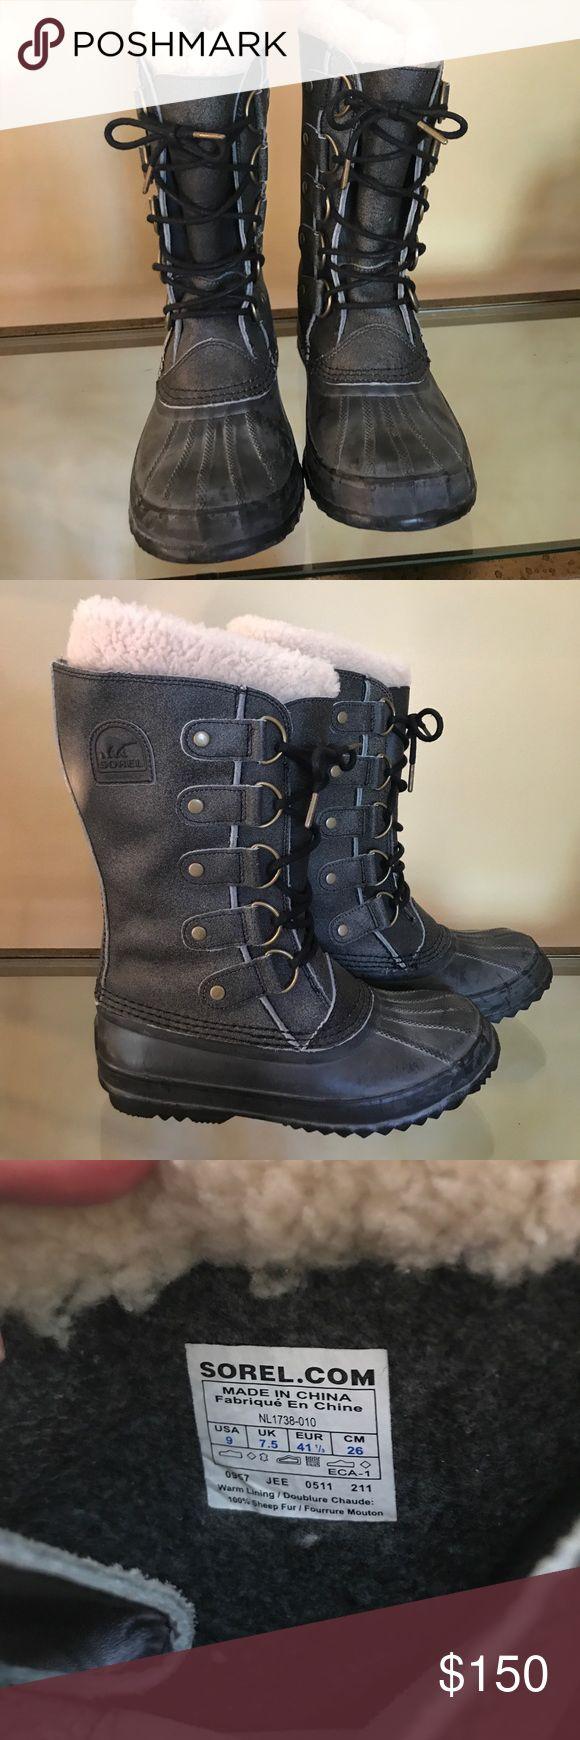 Sorel Winter Carnival Boots Grey Sorel Waterproof boots • 100% sheep fur lining • Size 9 • Excellent condition Sorel Shoes Winter & Rain Boots